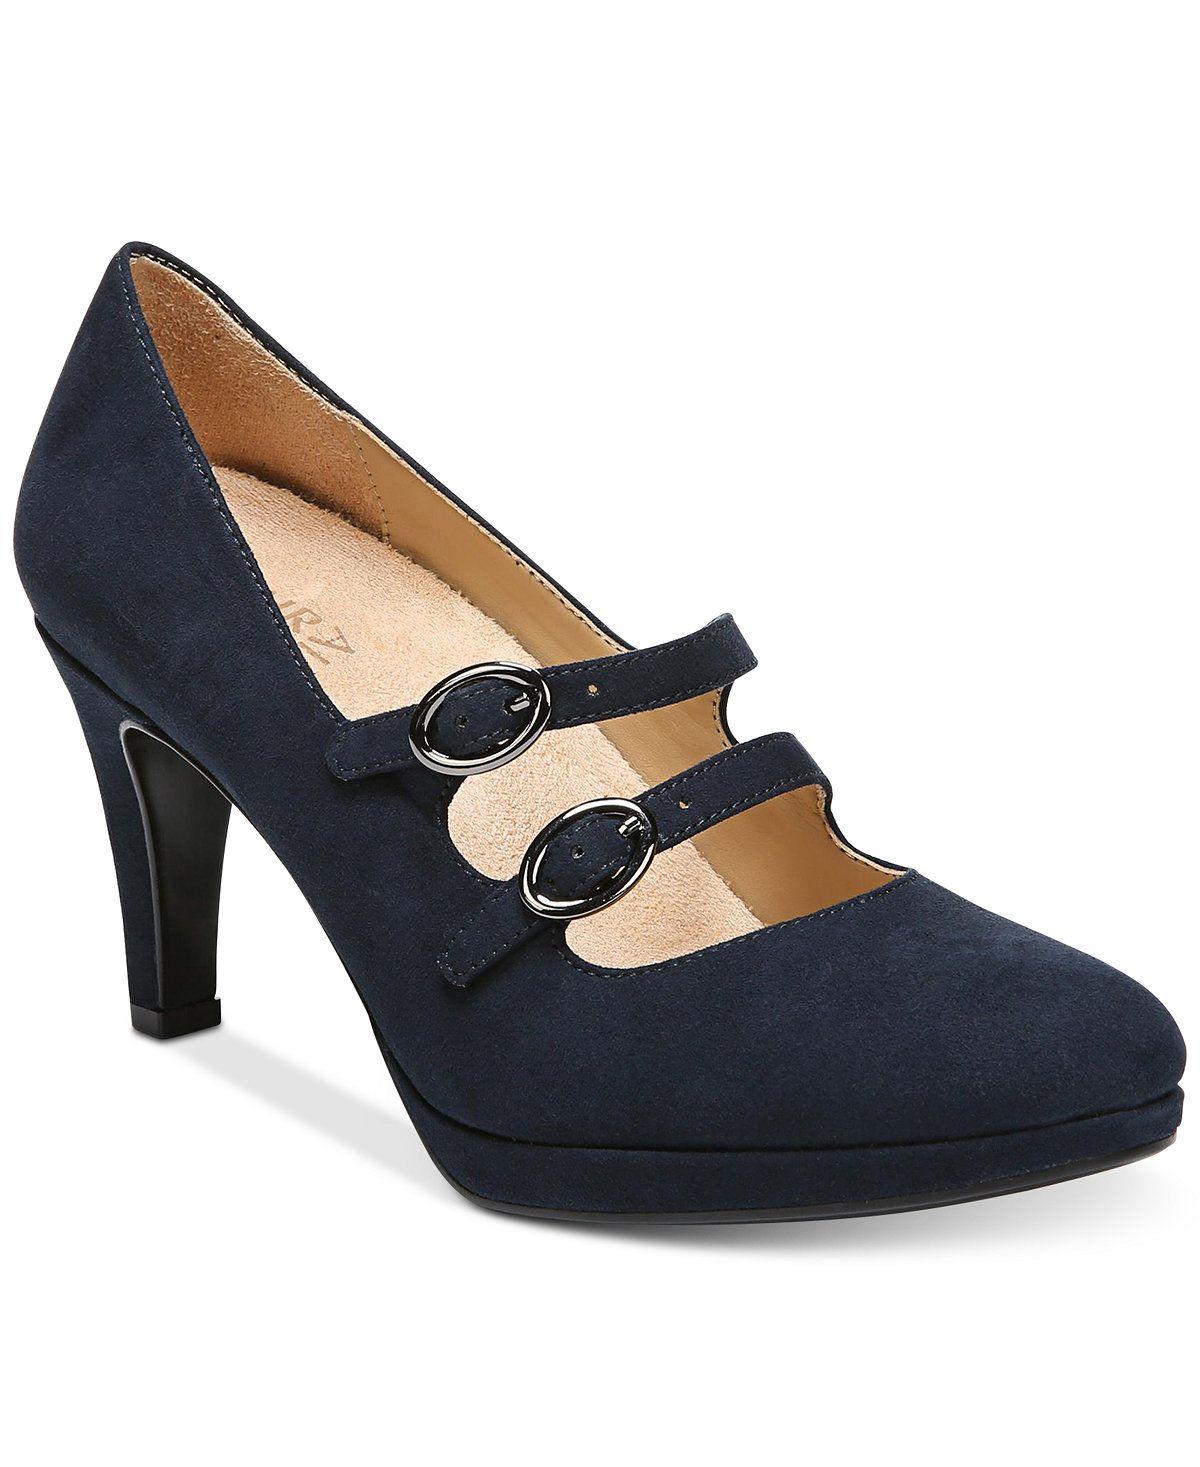 add8ecba2fab Naturalizer Prudence Pumps - Pumps - Shoes - Macy s